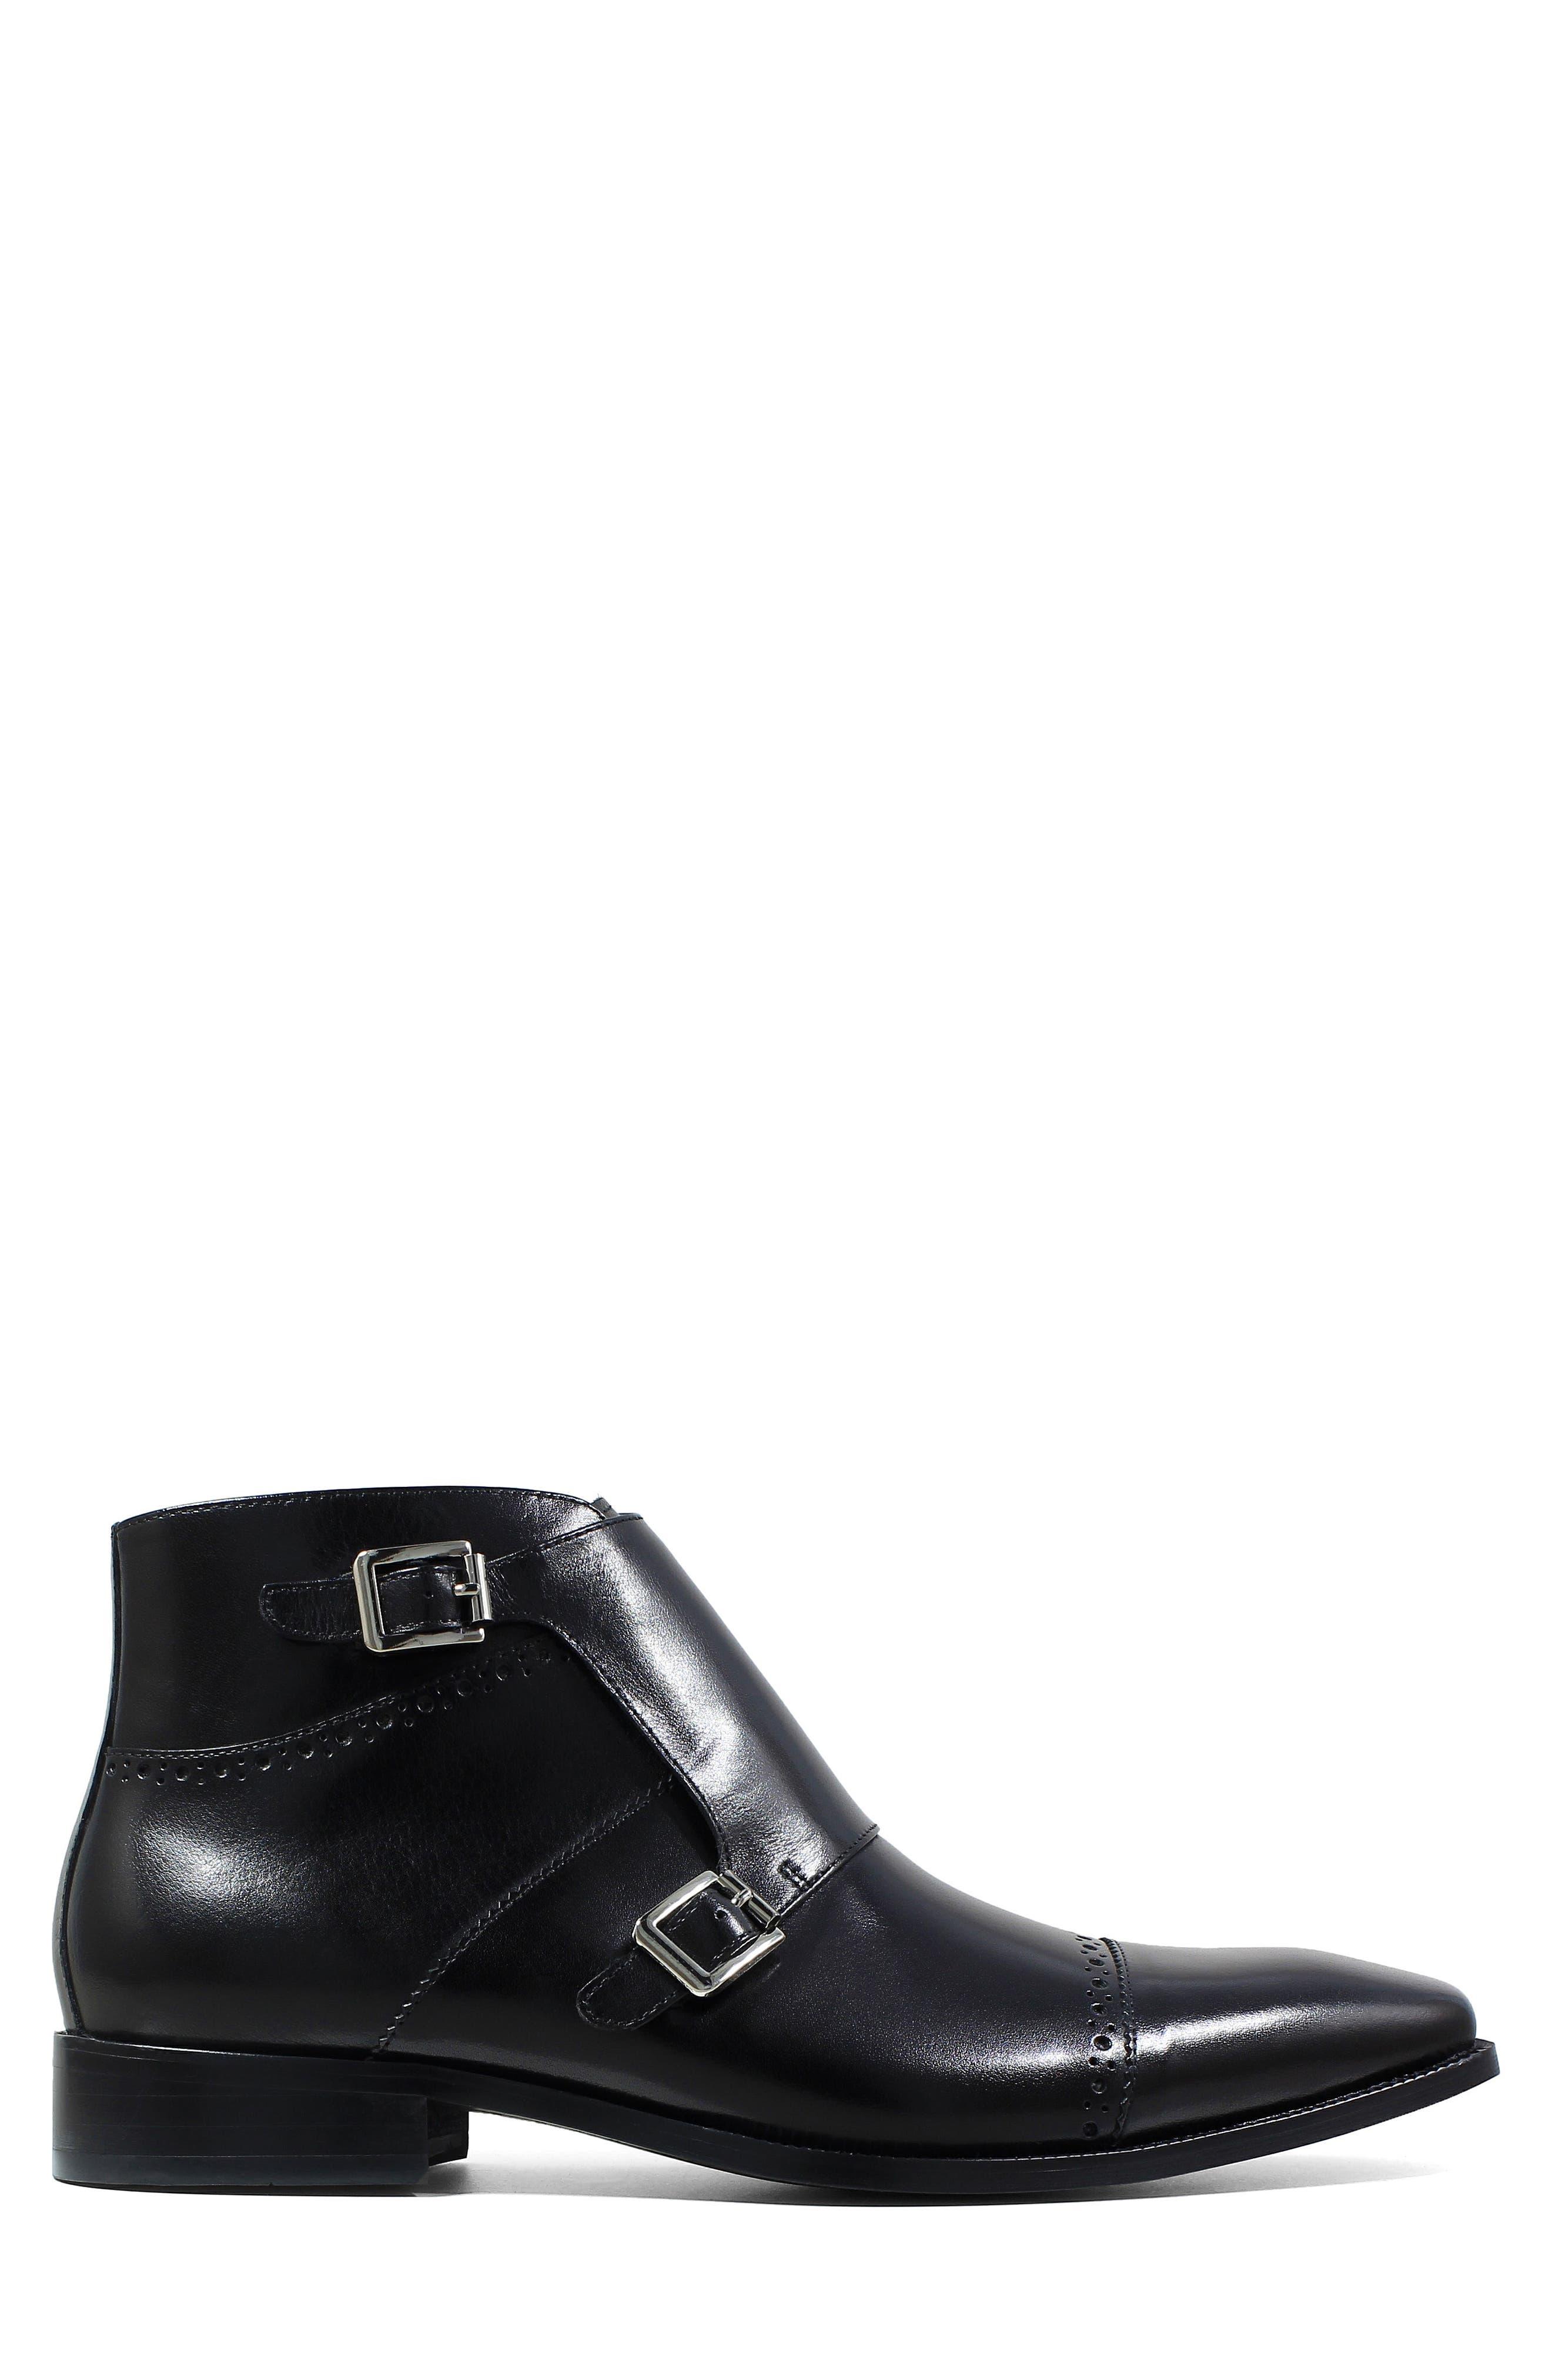 Kason Double Monk Strap Boot,                             Alternate thumbnail 3, color,                             001